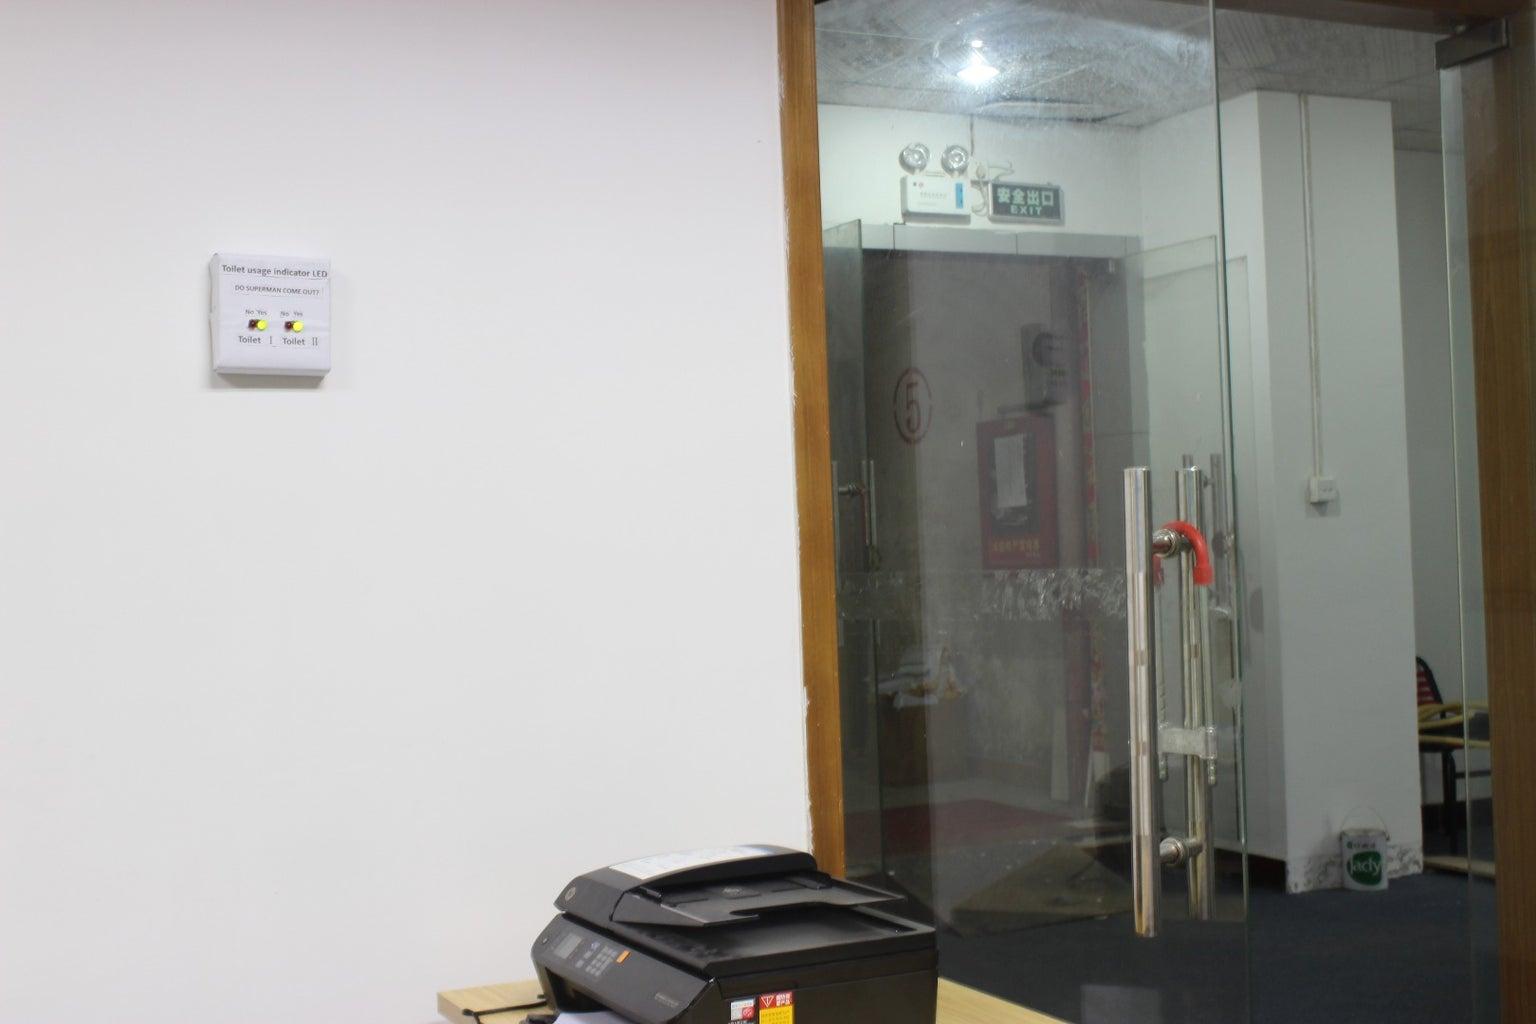 ESP8266 Wireless Toilet Usage Indicator (Smart Home)